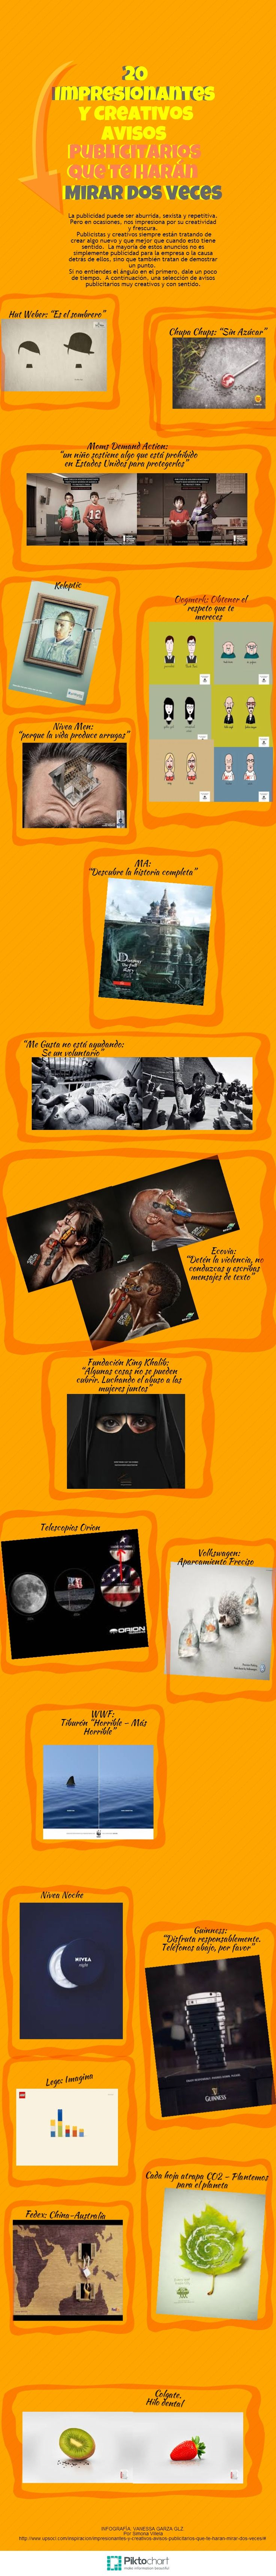 20 Impresionantes Y Creativos Avisos Publicitarios Que Te Harán Mirar Dos Veces | @Piktochart Infographic